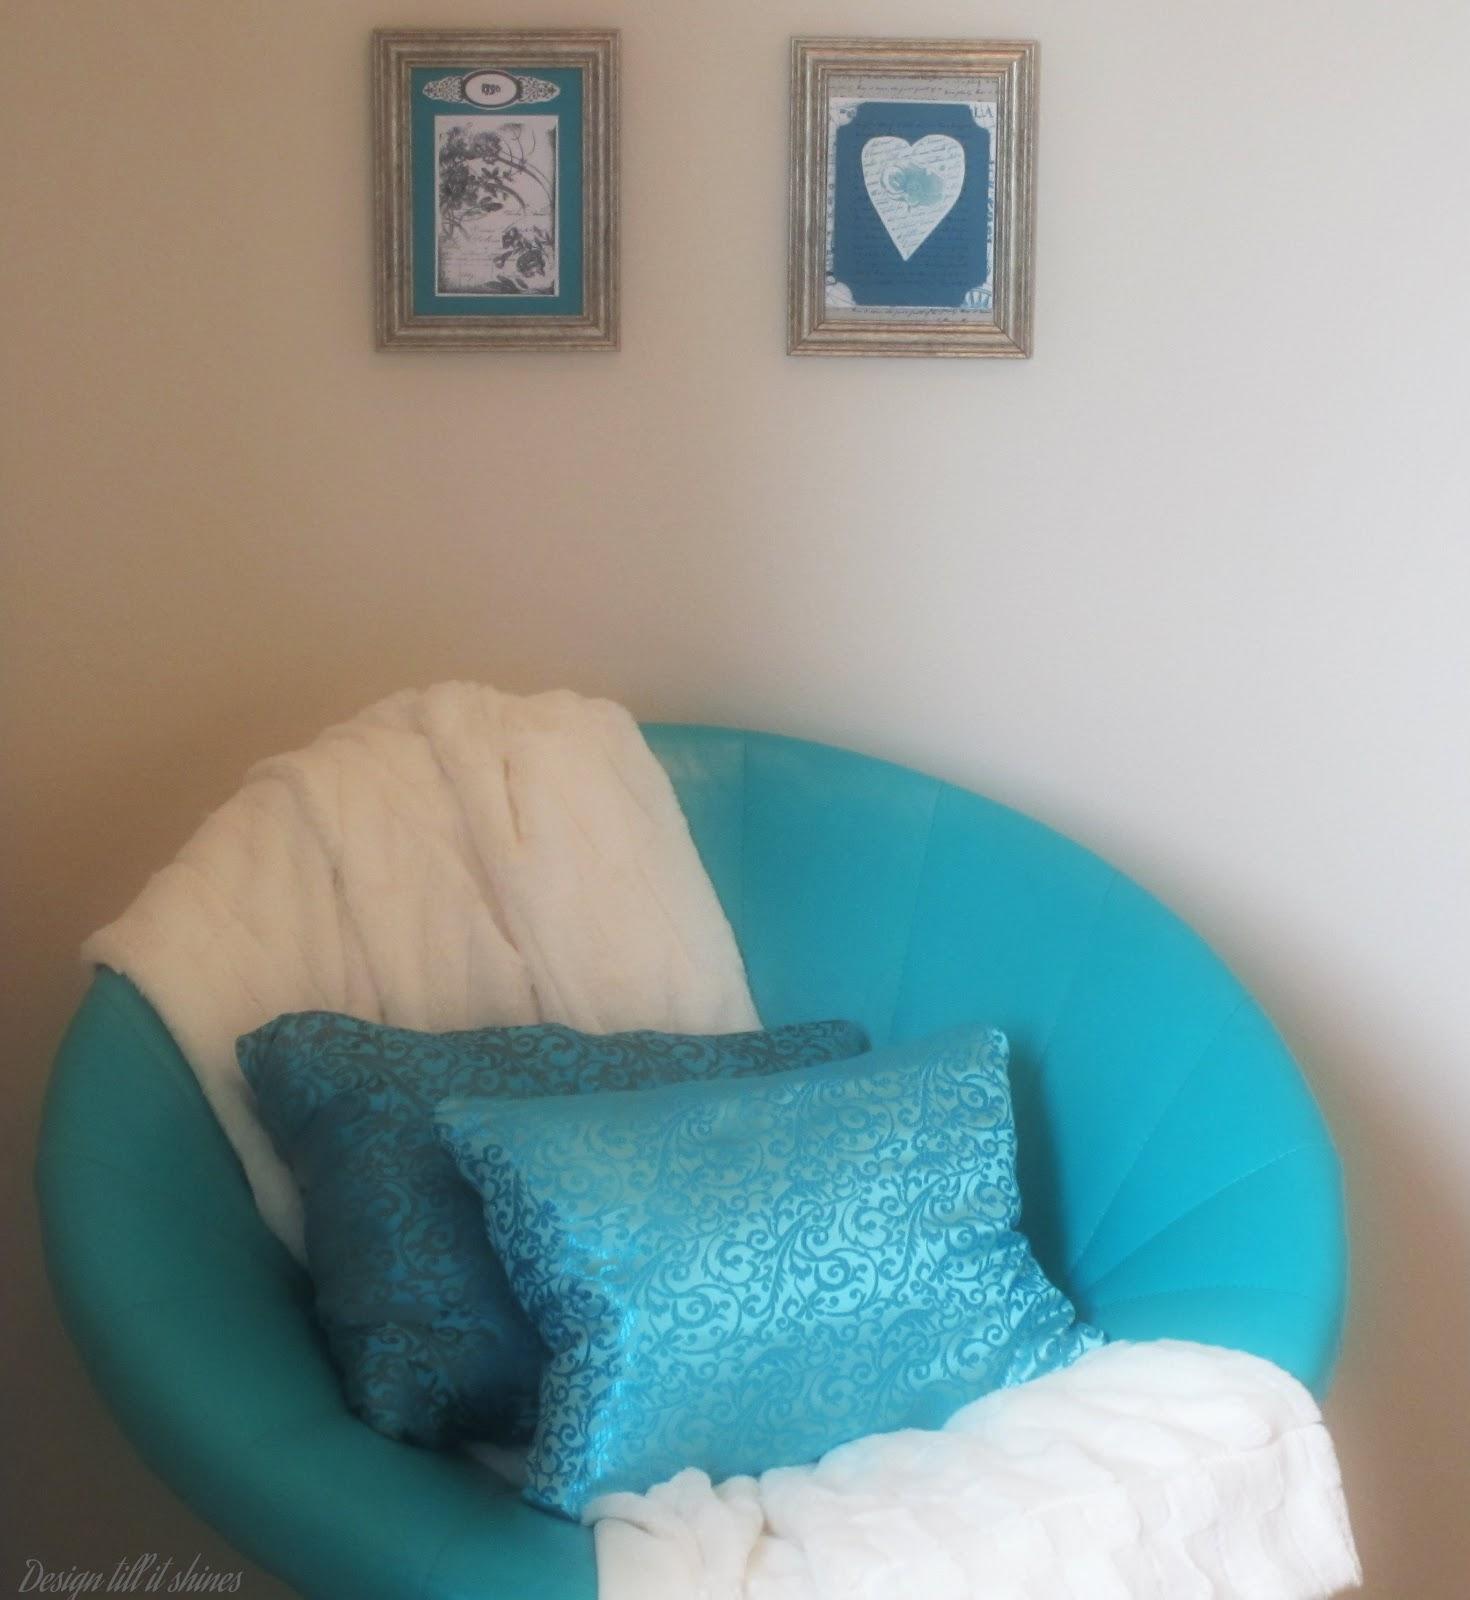 Design till it Shines Modern chair revival